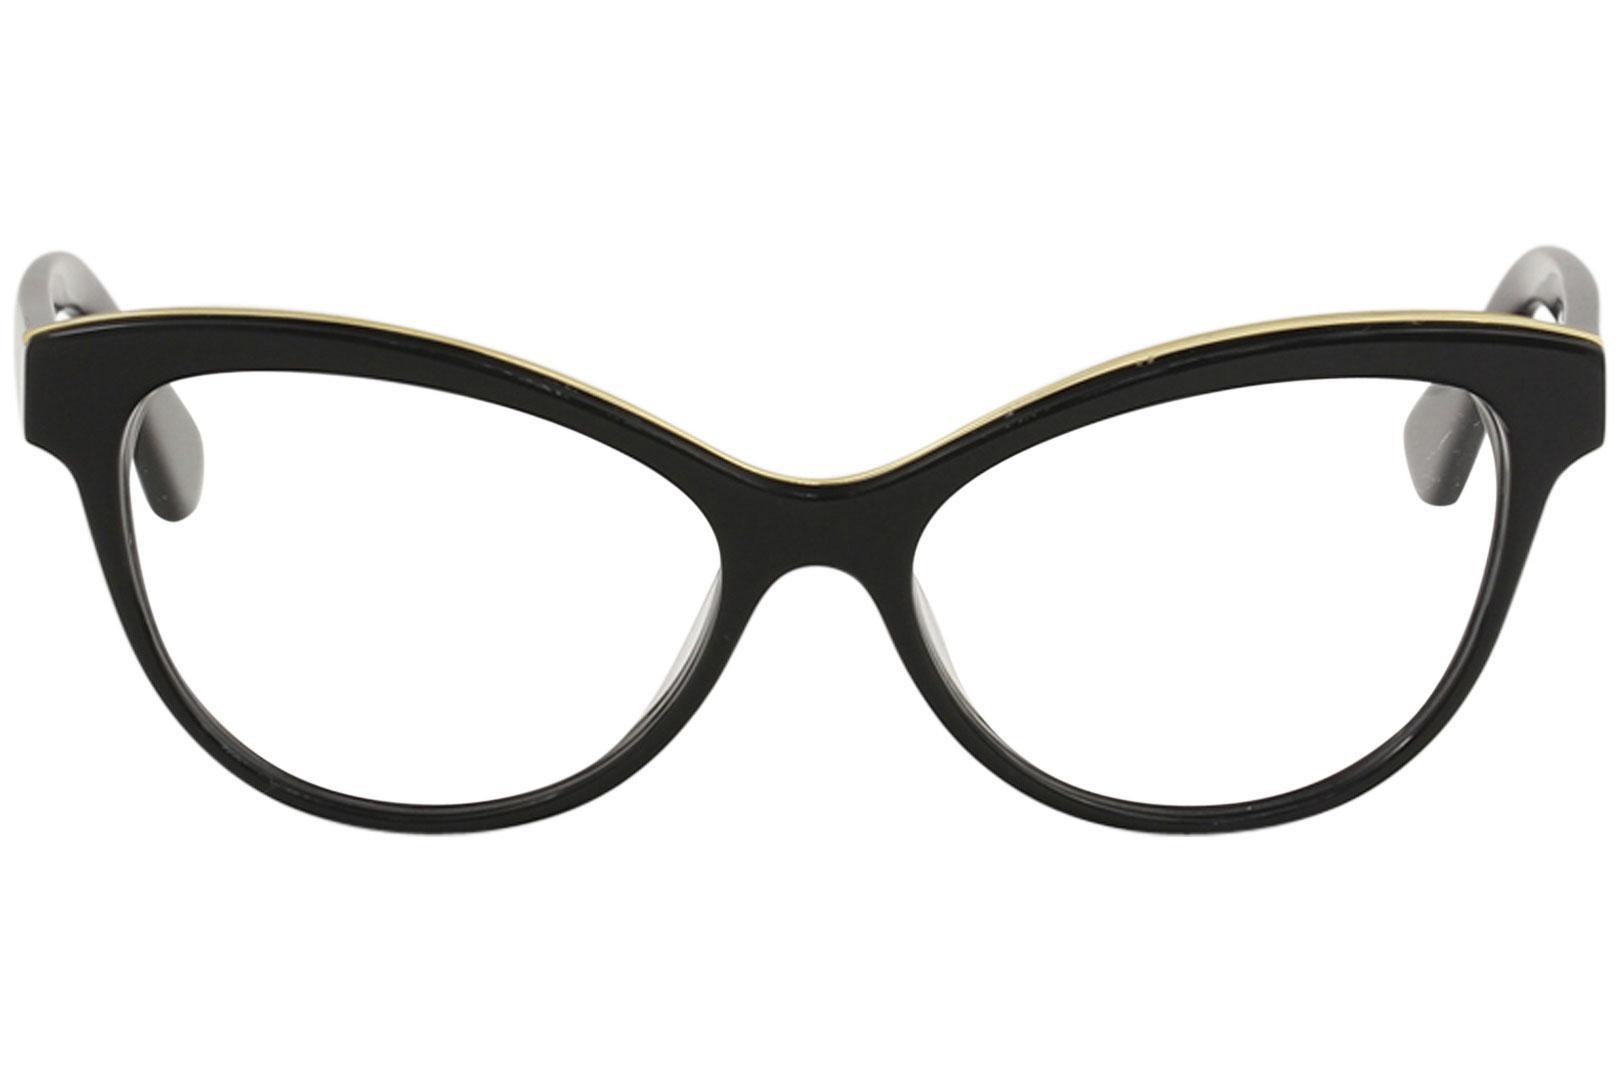 13a585acc5 Zac Posen Women s Eyeglasses Jayce Full Rim Optical Frame by Zac Posen